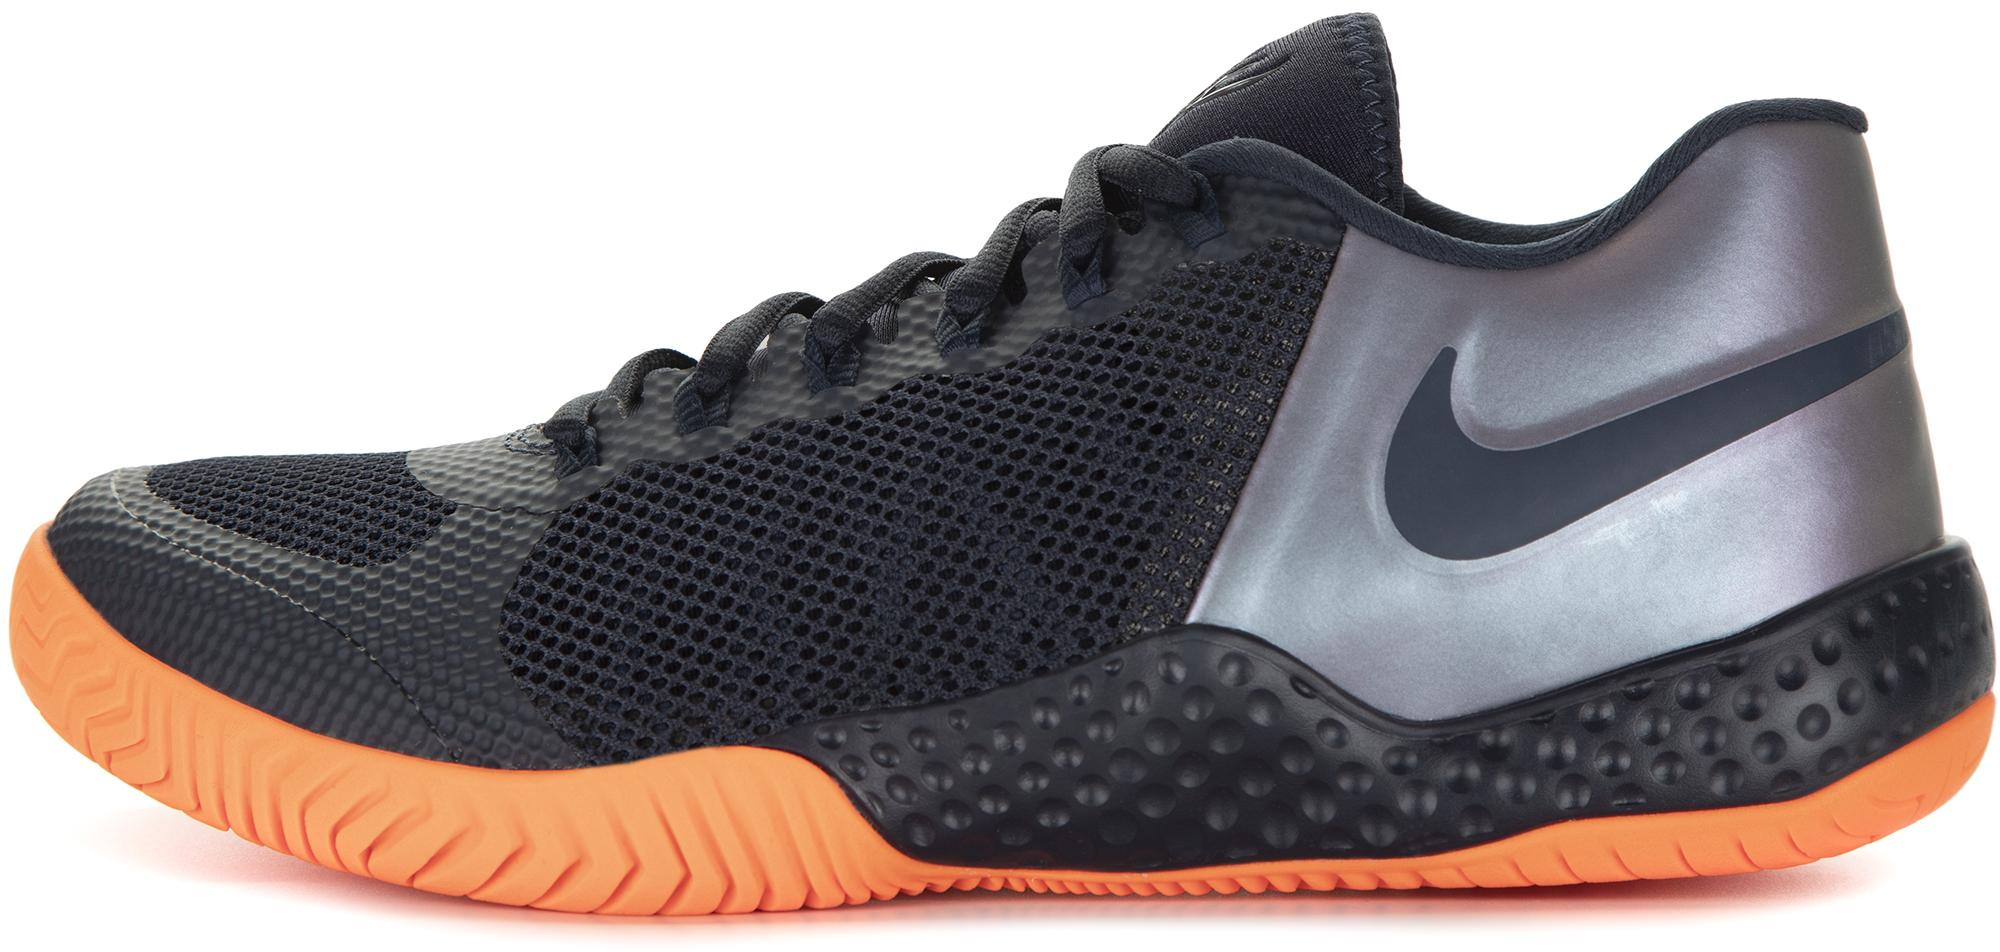 Nike Кроссовки женские Court Flare 2 QS, размер 40